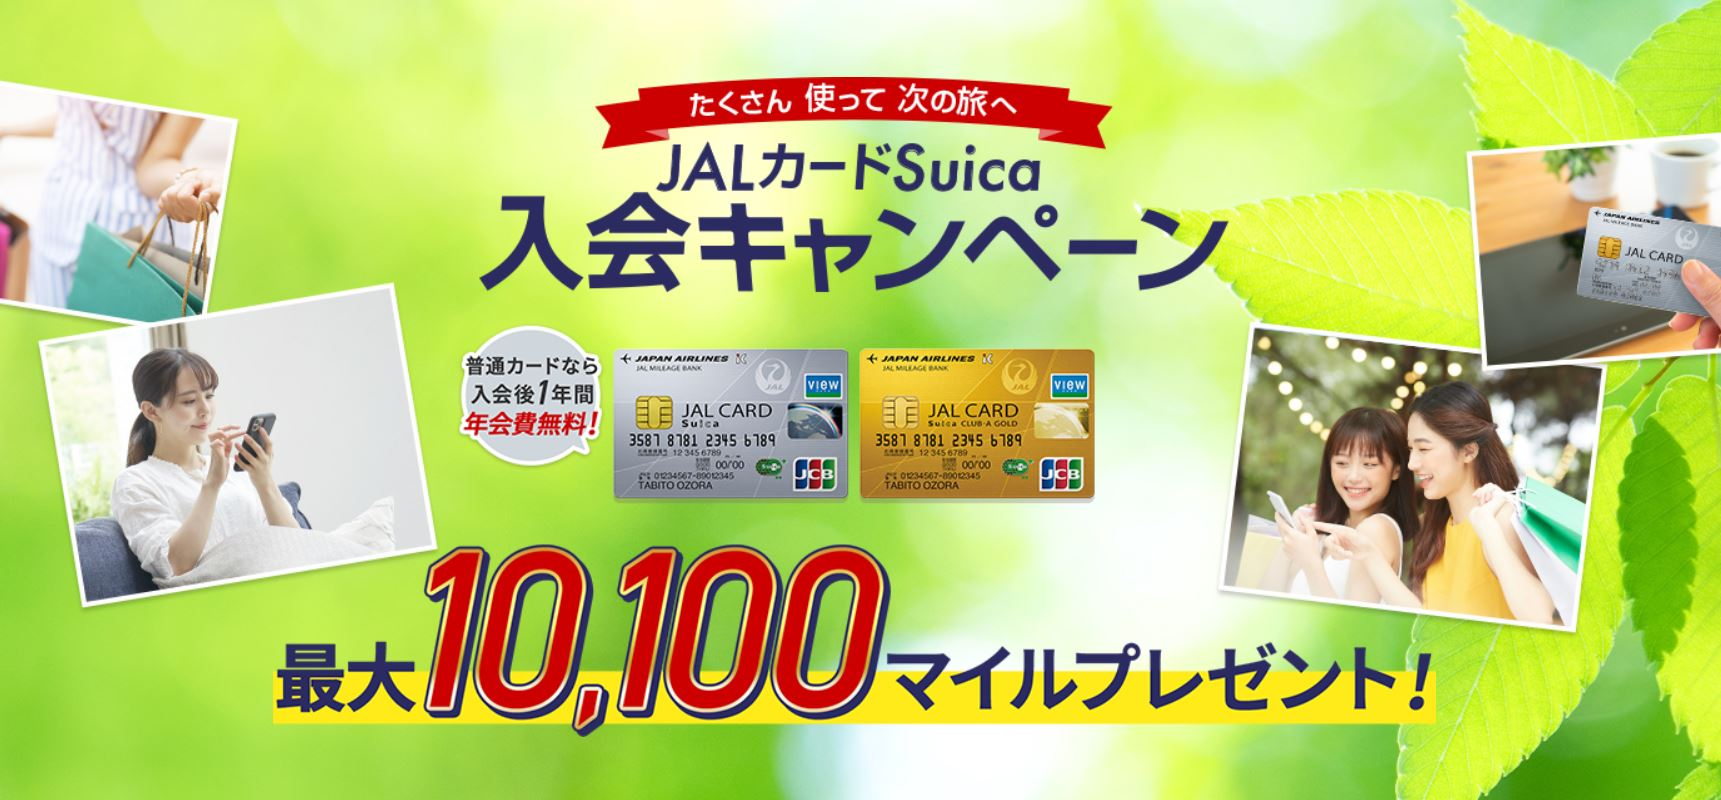 JALカードSuica入会キャンペーン